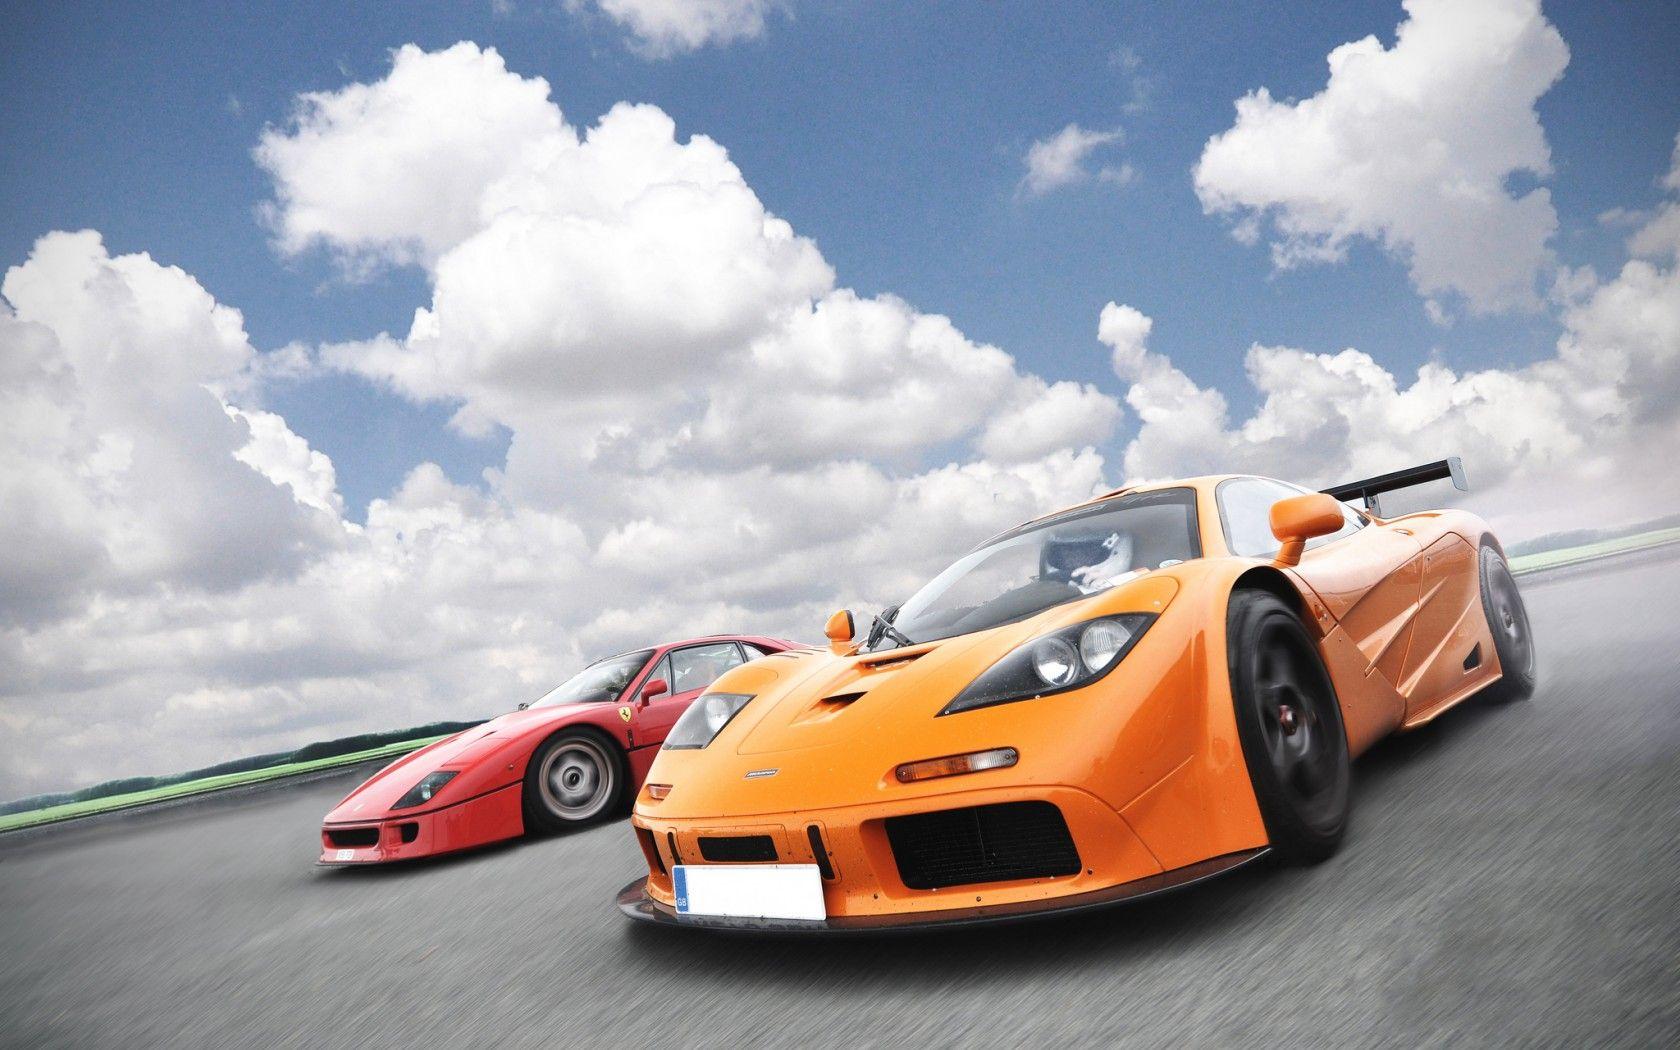 Mclaren F1 Lm Cars Pinterest Ferrari And Sport